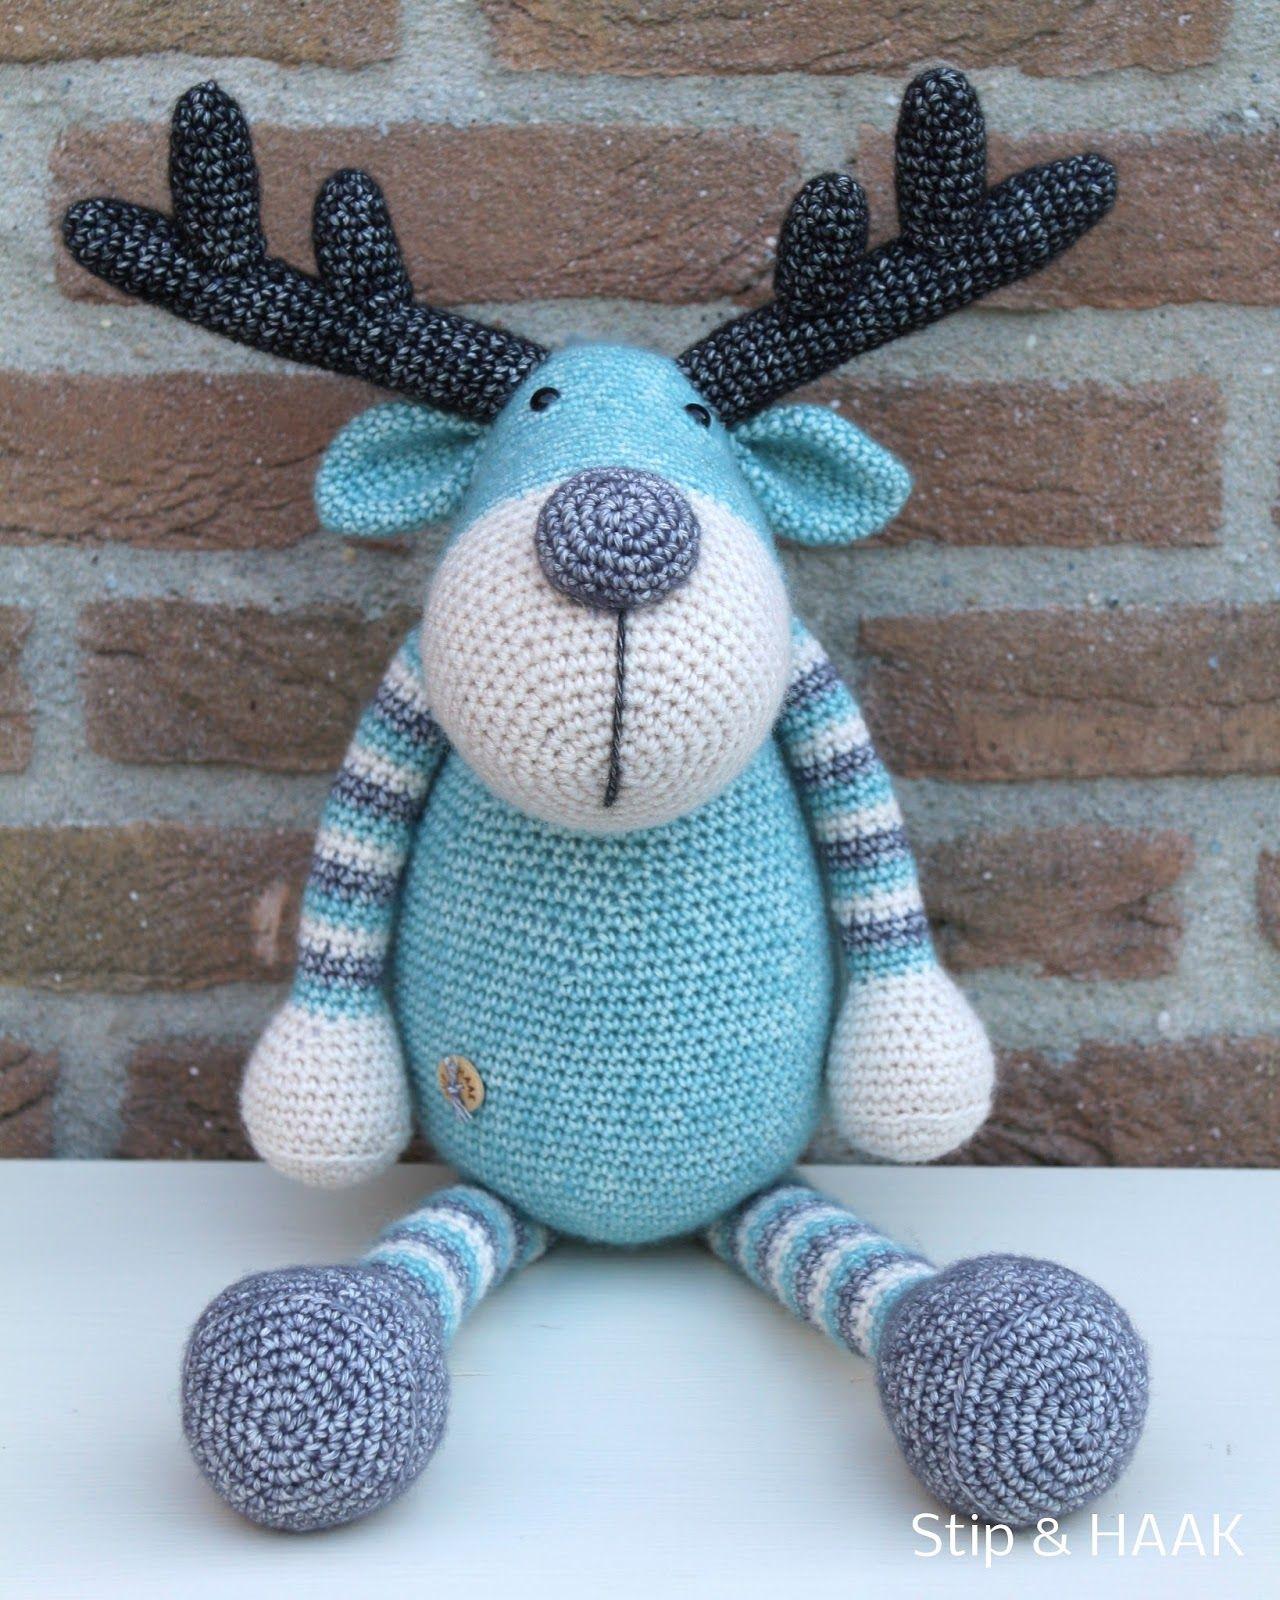 Stip & HAAK: Stoere Ralf | I Love Crochet | Pinterest | Elch, Häkeln ...